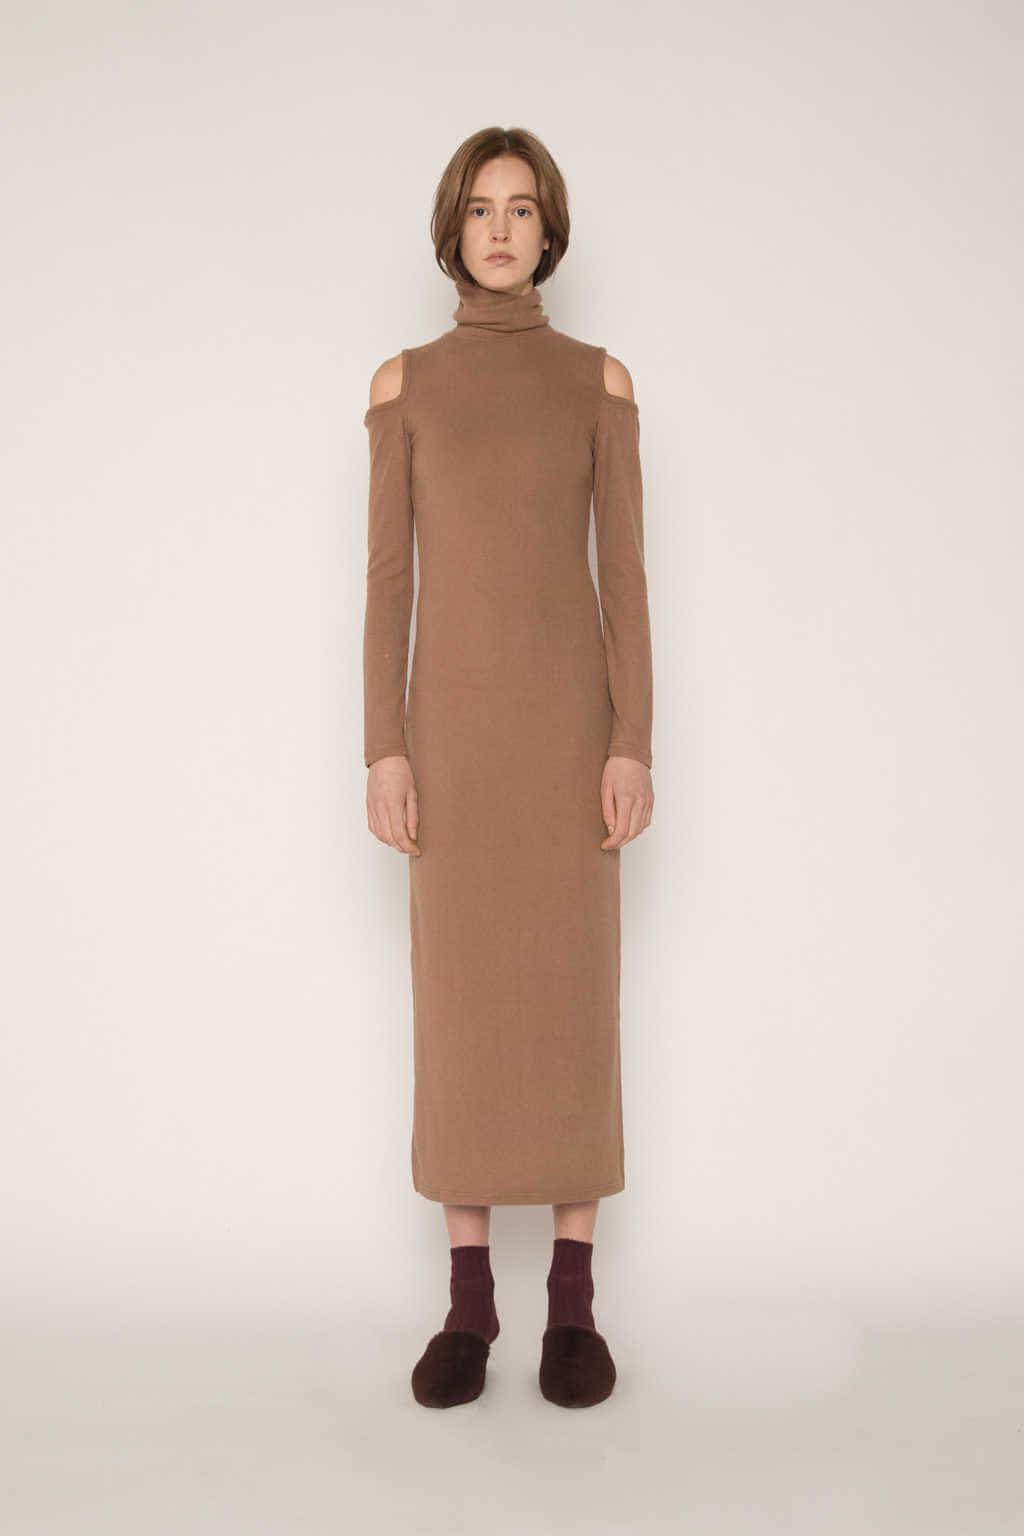 Dress H339 Beige 1